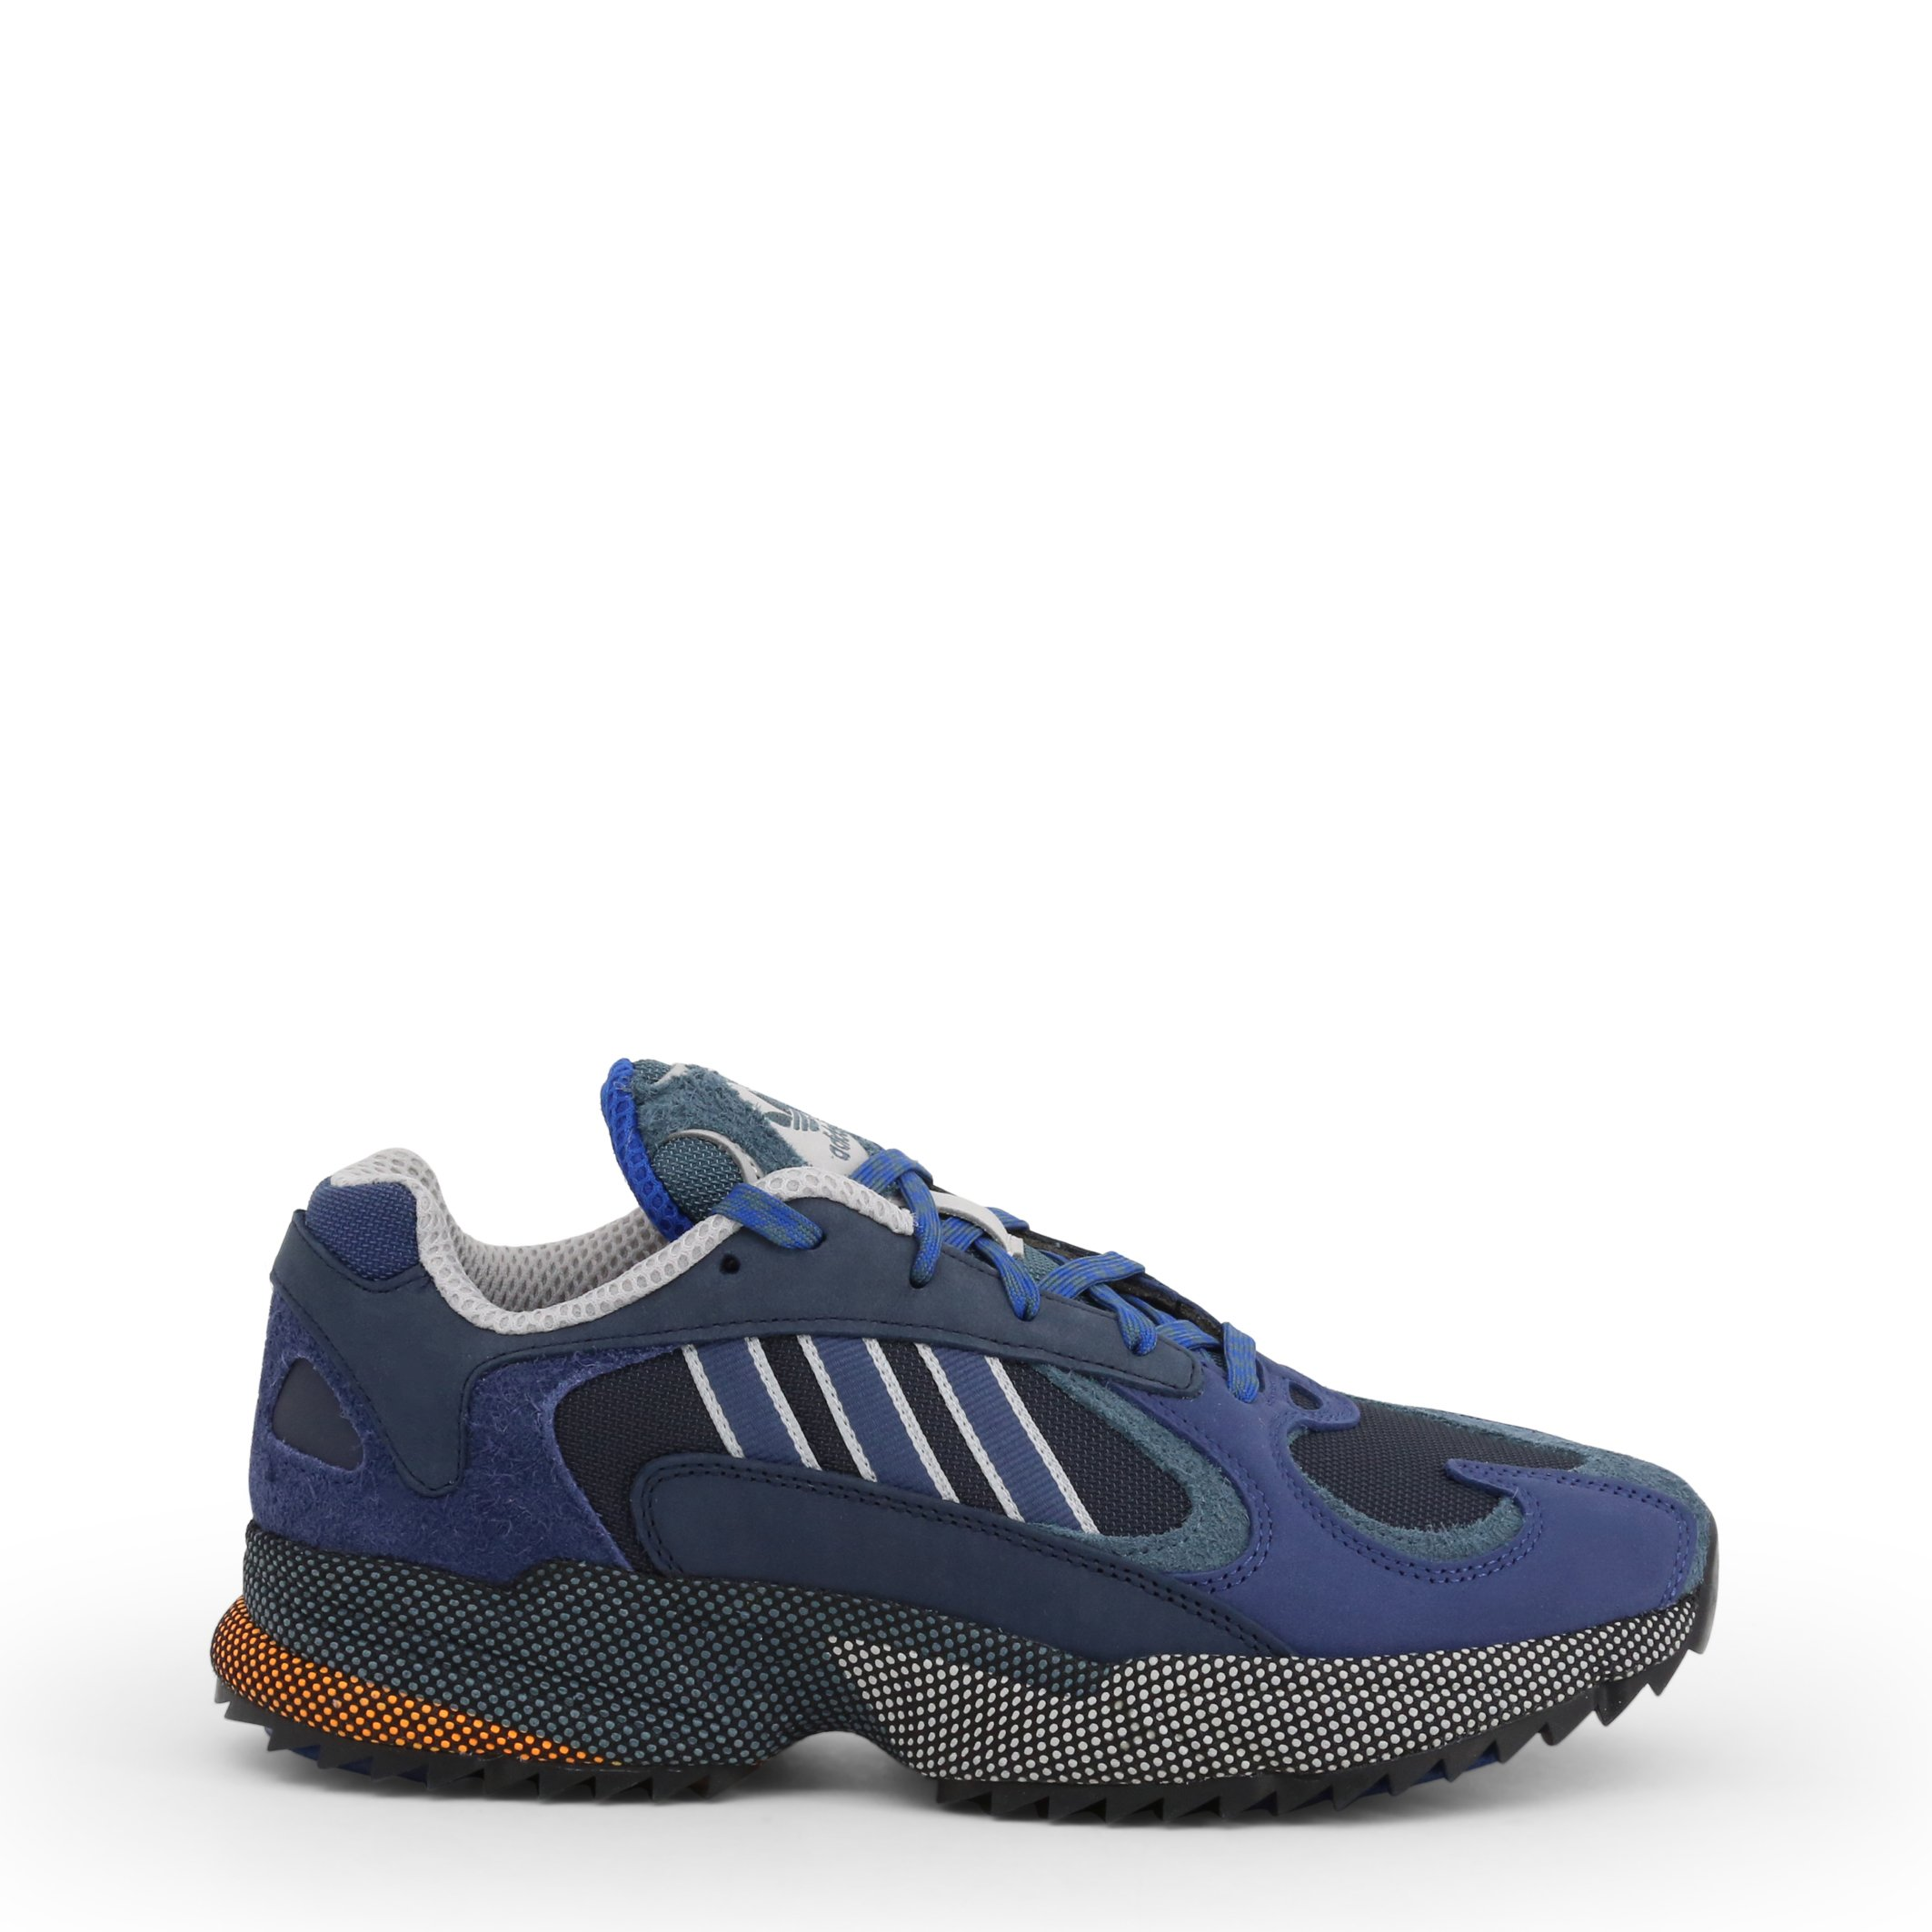 Adidas Unisex Trainers Various Colours BD7654 - blue 8.5 UK